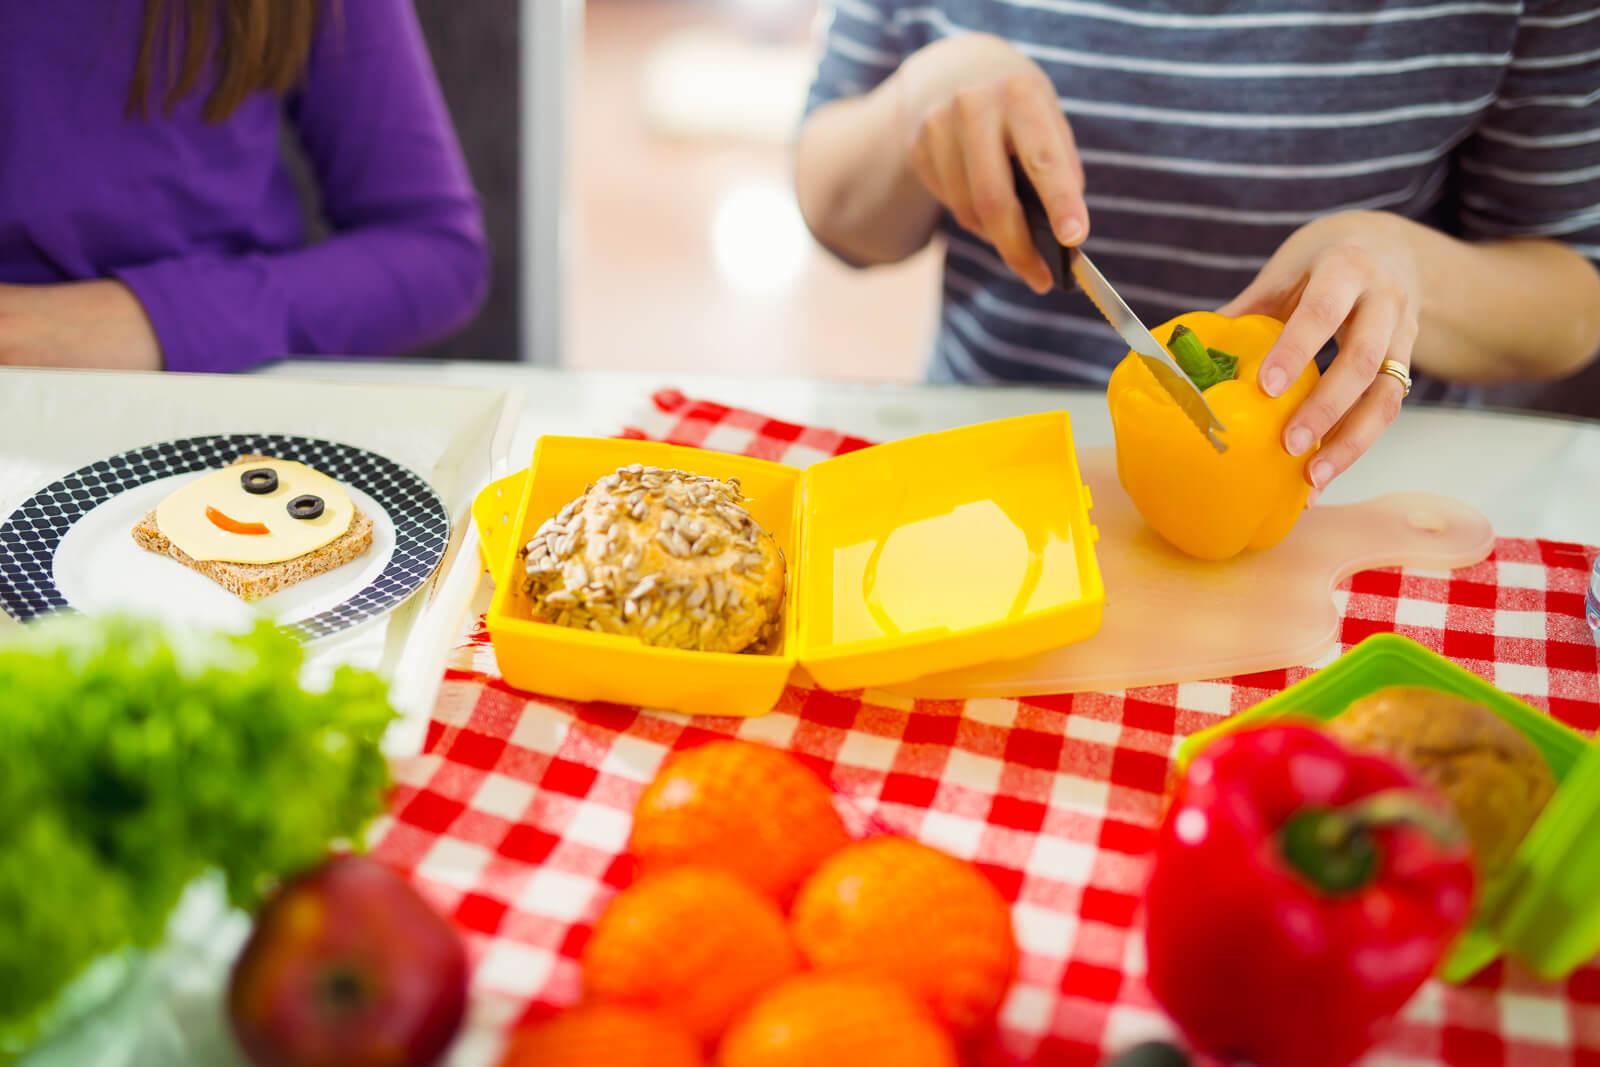 O zdravi prehrani